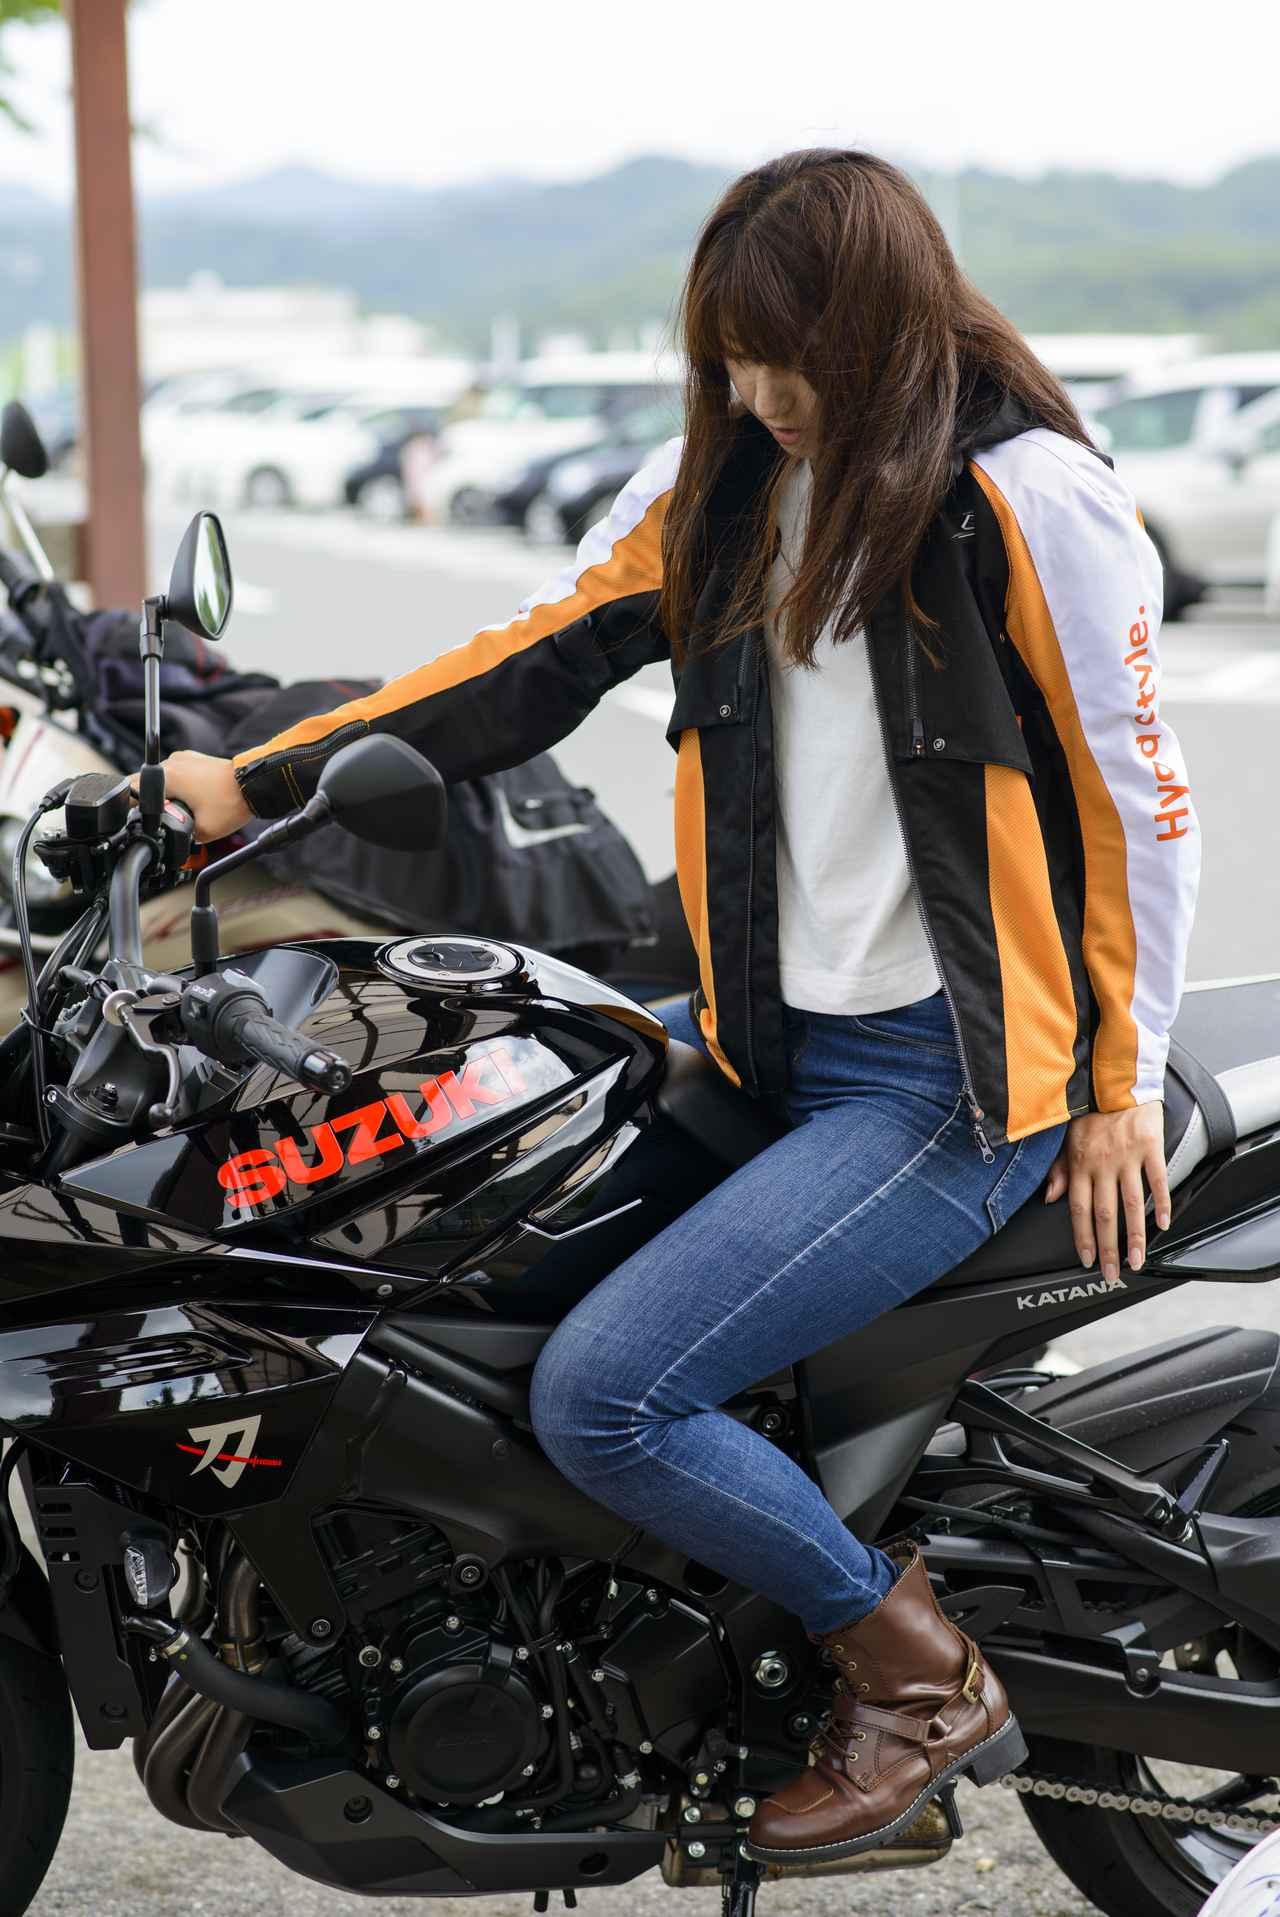 Images : 12番目の画像 - 大関さおり × スズキ「KATANA」 - webオートバイ